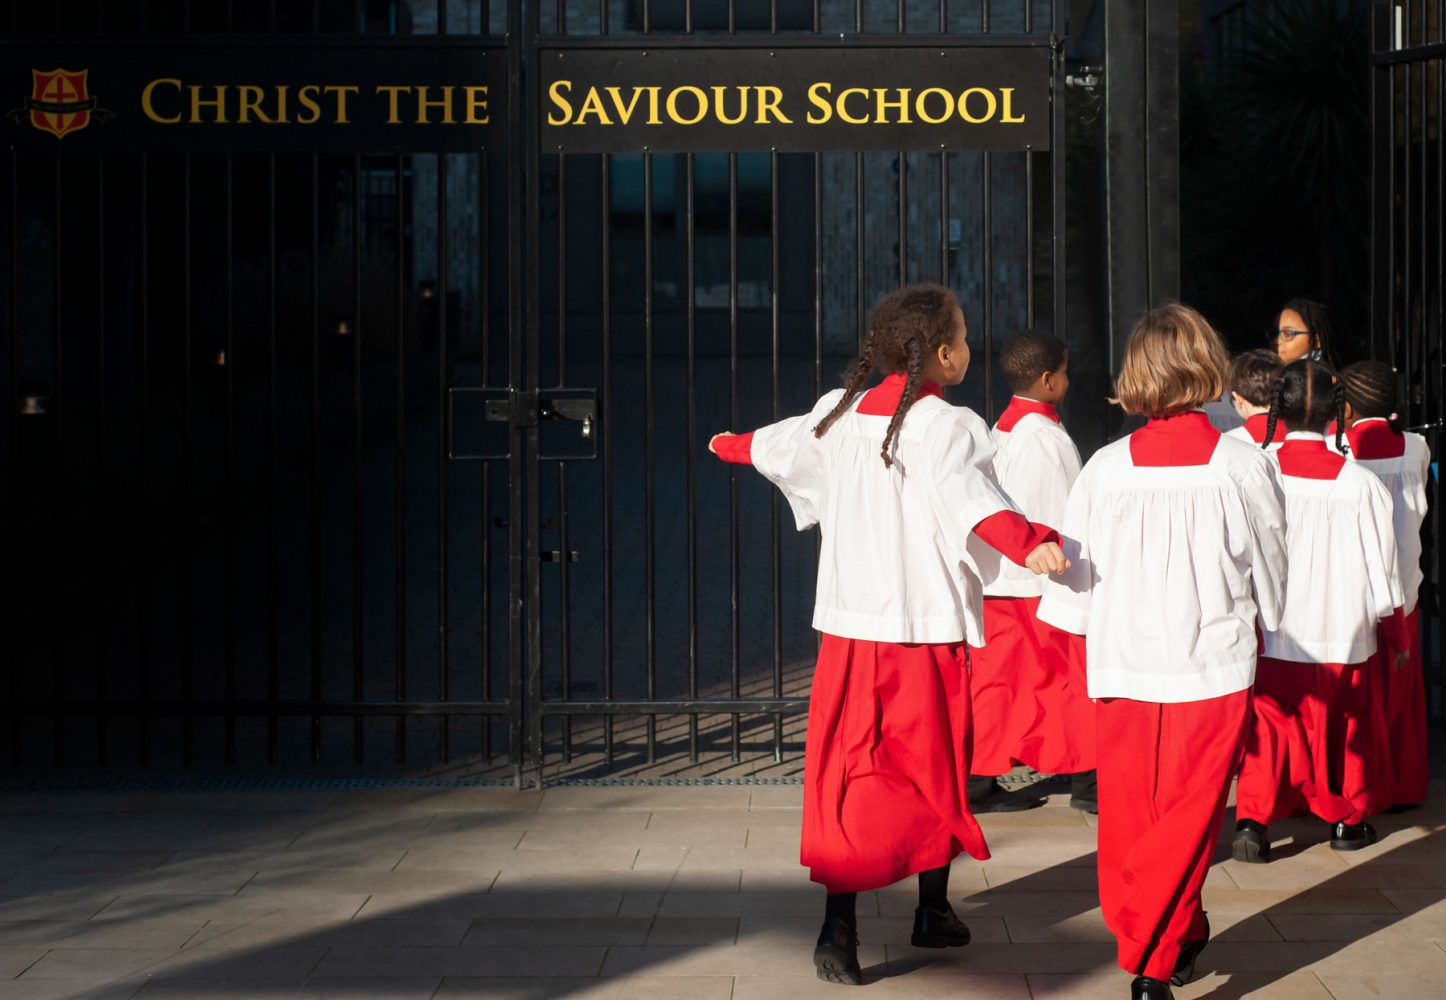 Primary school website photogrpahy of school choir returning through school gates